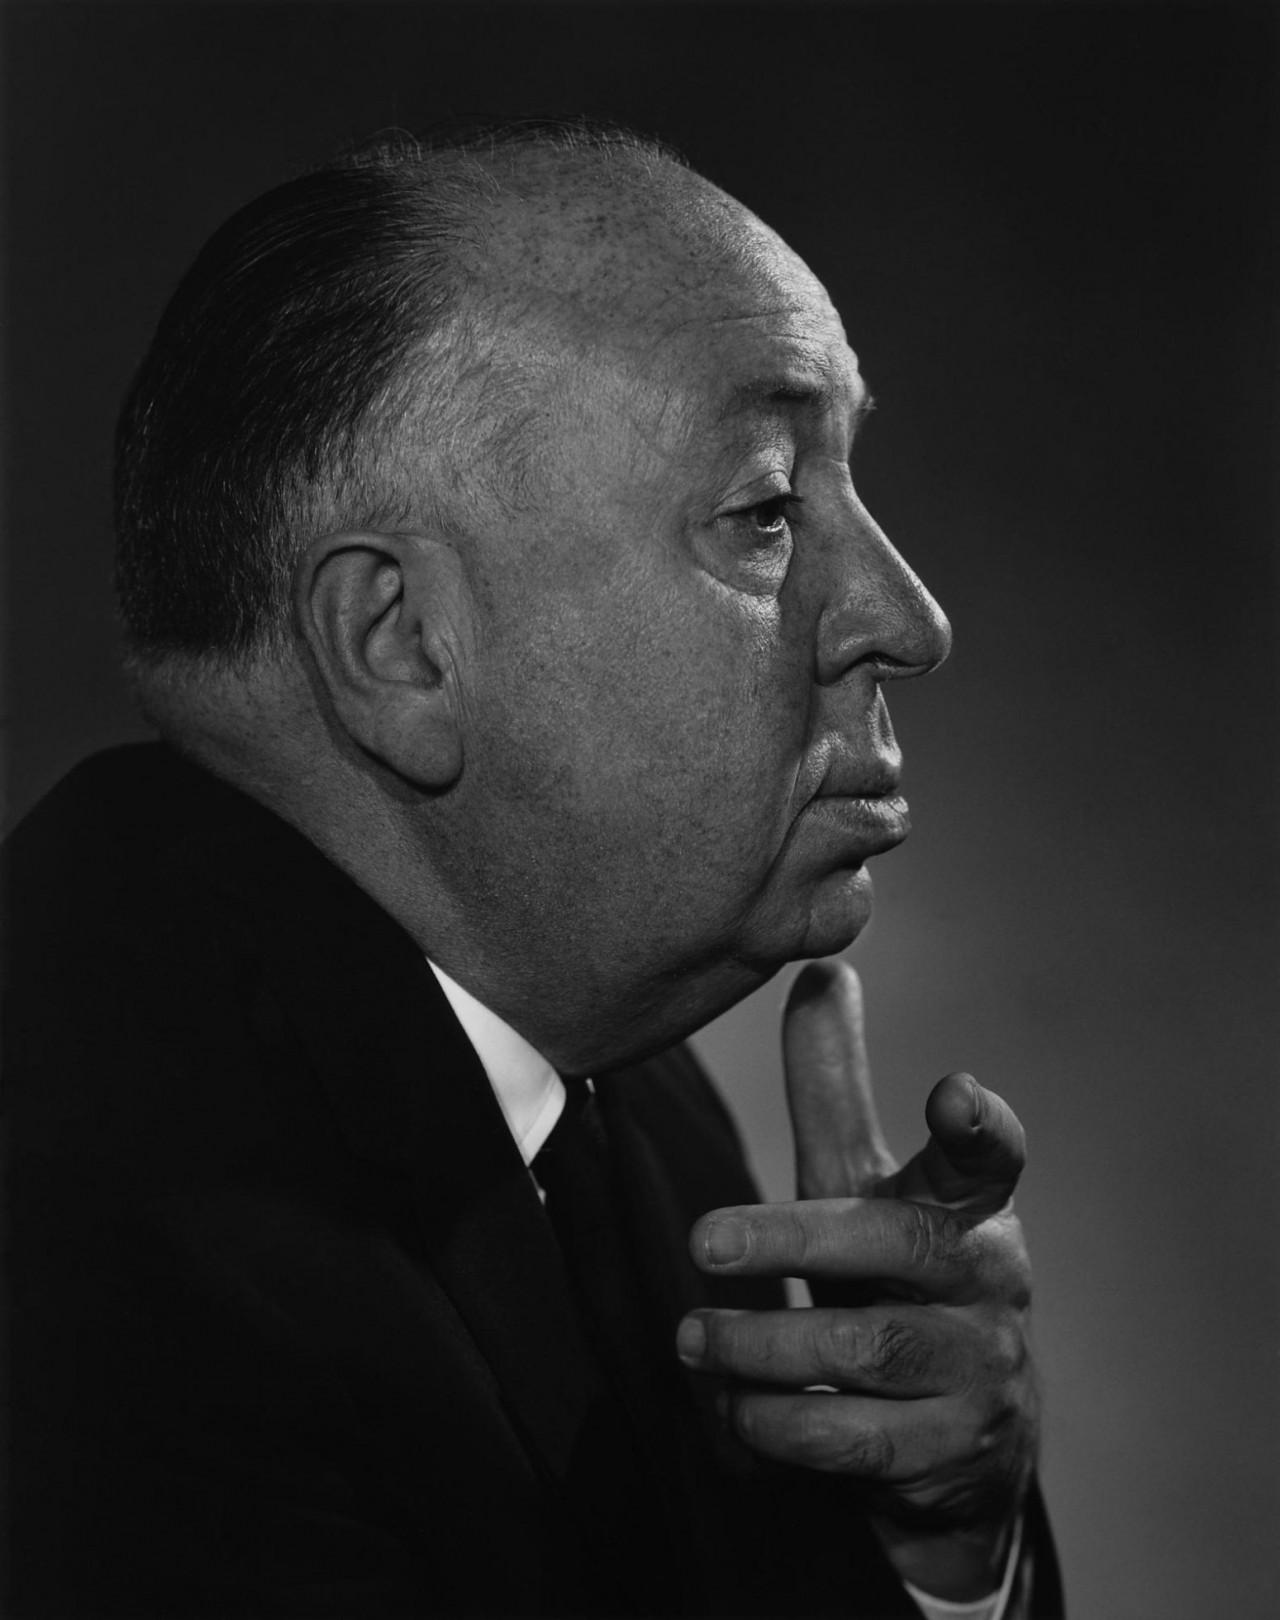 Альфред Хичкок, 1960. Автор Юсуф Карш